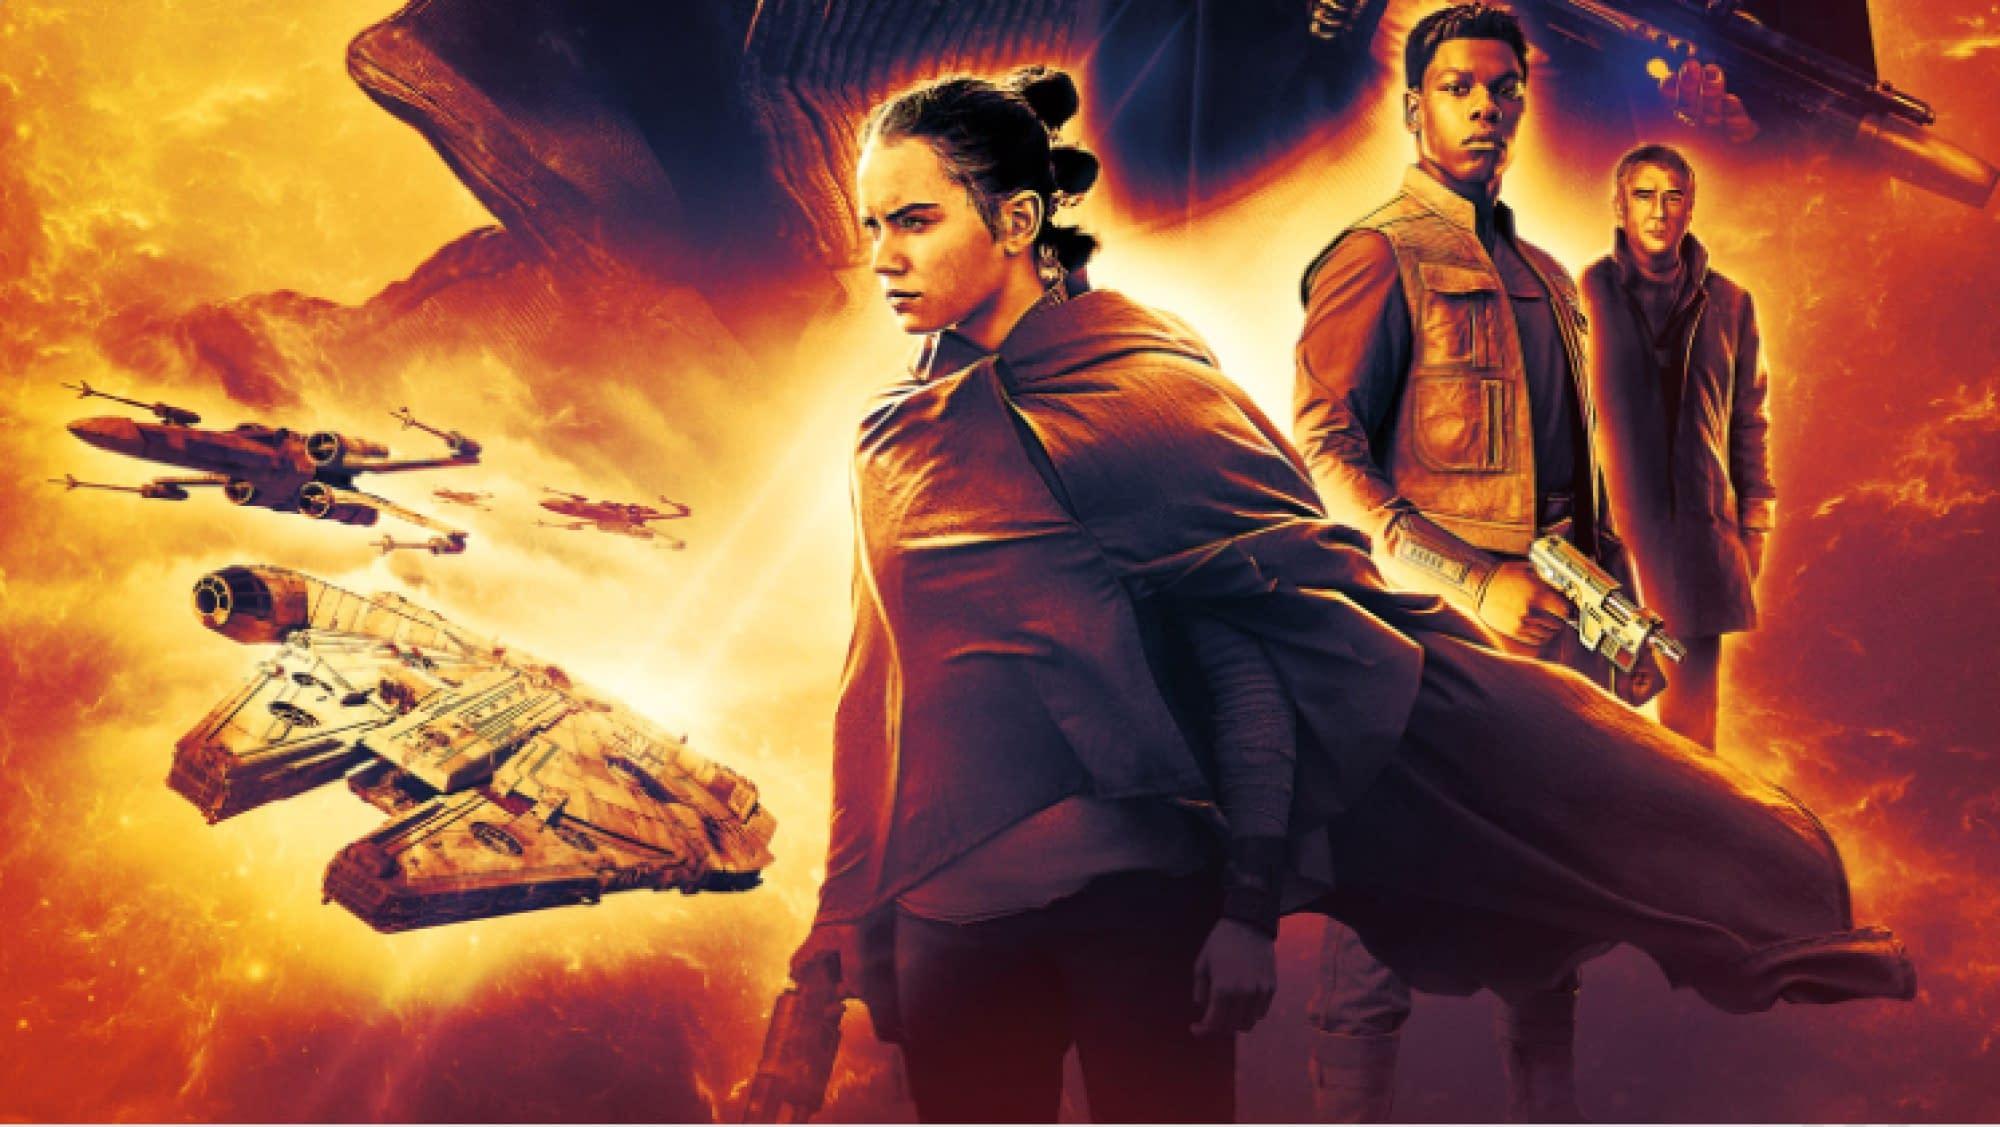 """Star Wars: Resistance Reborn"" - Wedge Antilles Is Back! And #SpaceMarried"